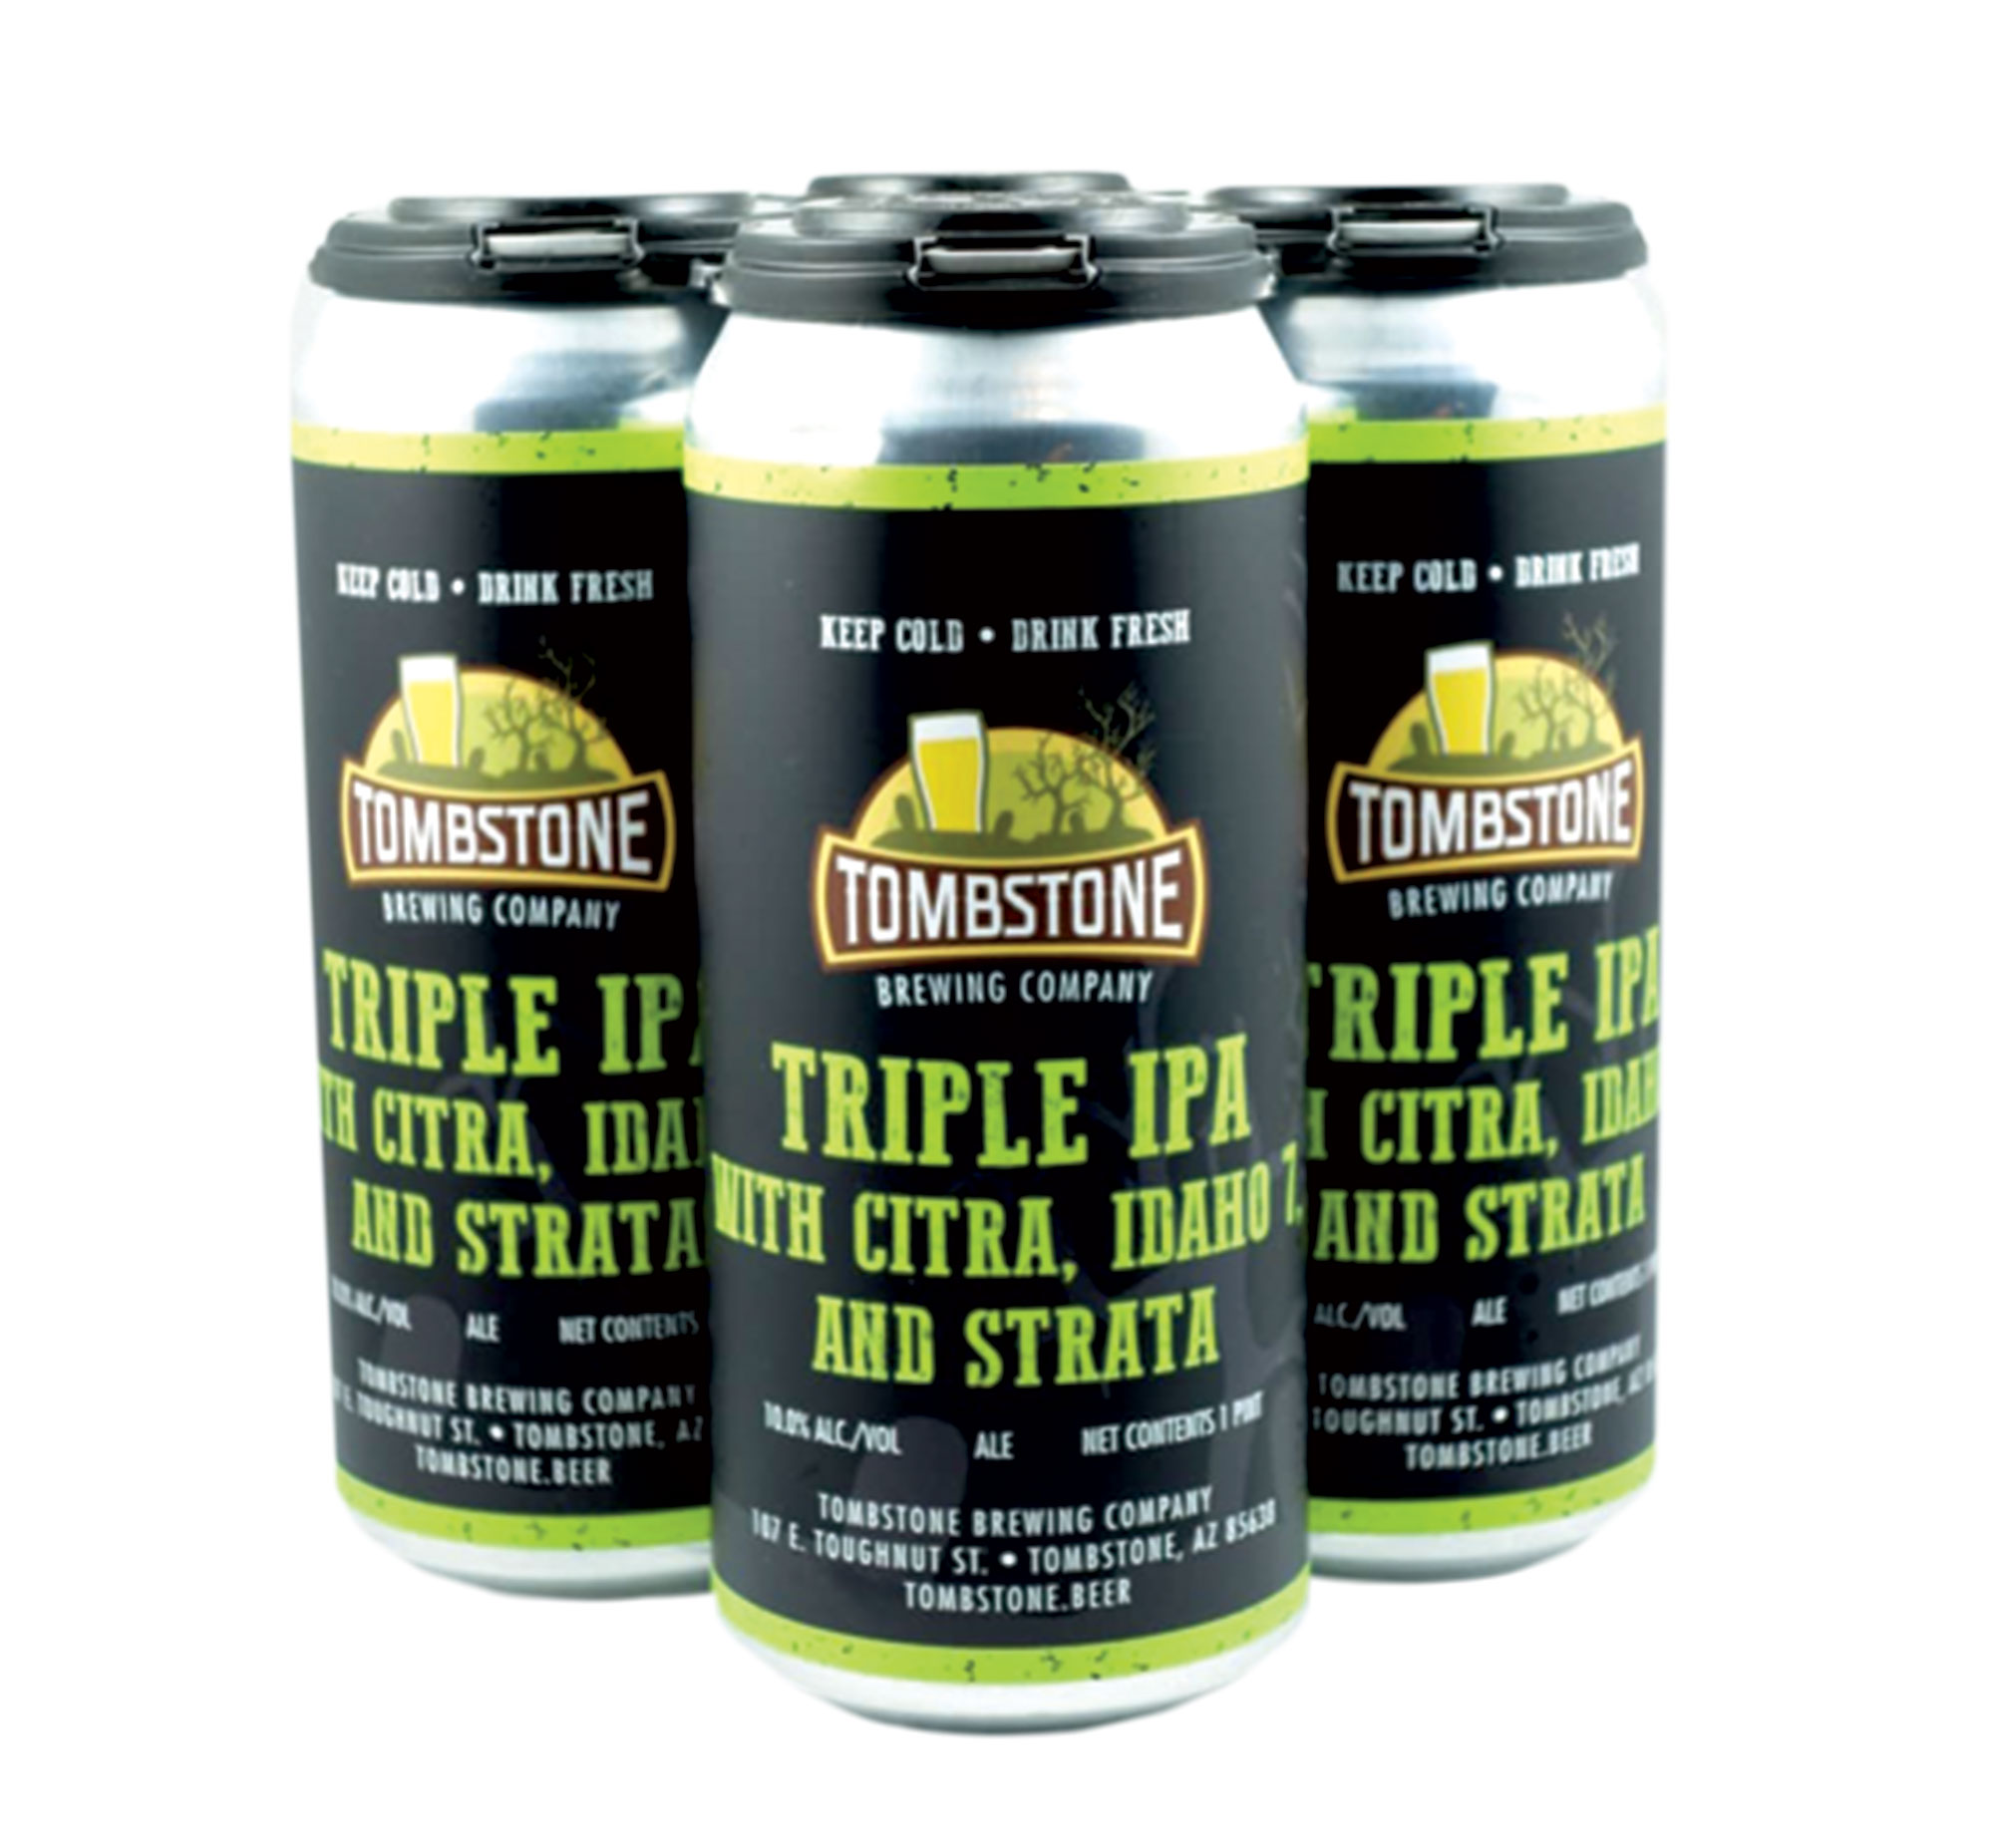 Photo courtesy Tombstobe Brewing Co.